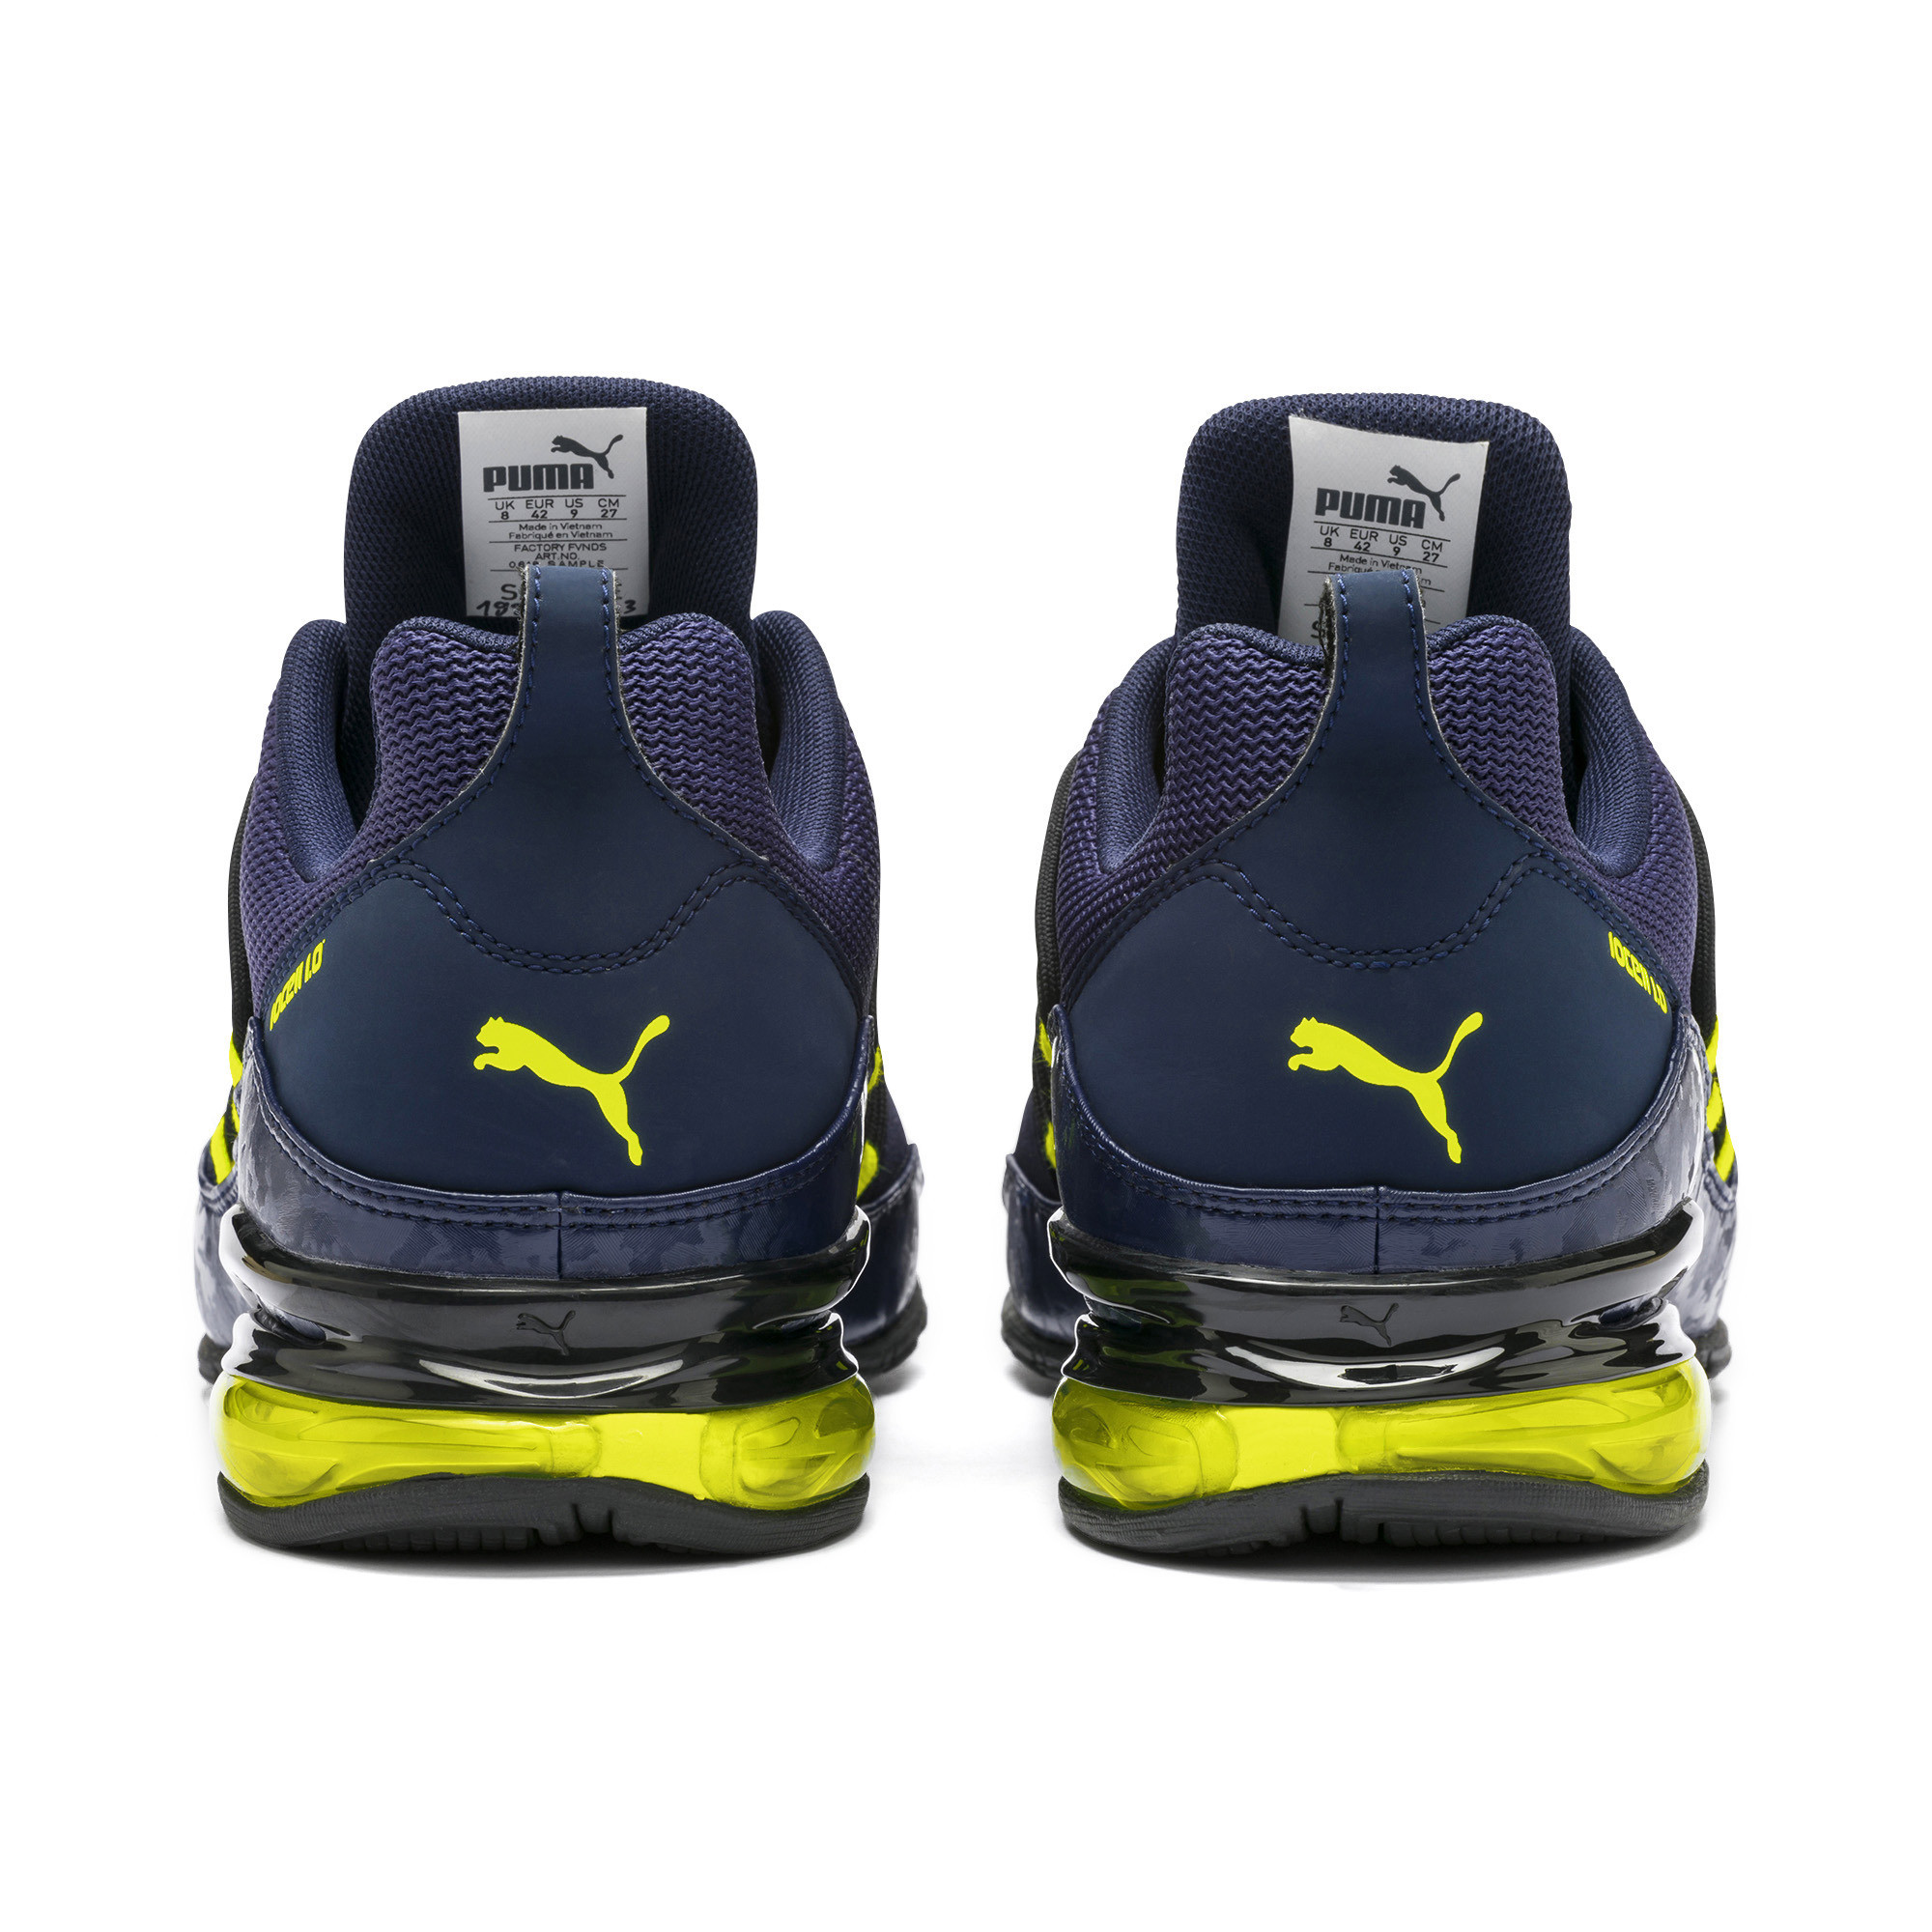 PUMA-CELL-Regulate-Camo-Men-s-Training-Shoes-Men-Shoe-Running thumbnail 10